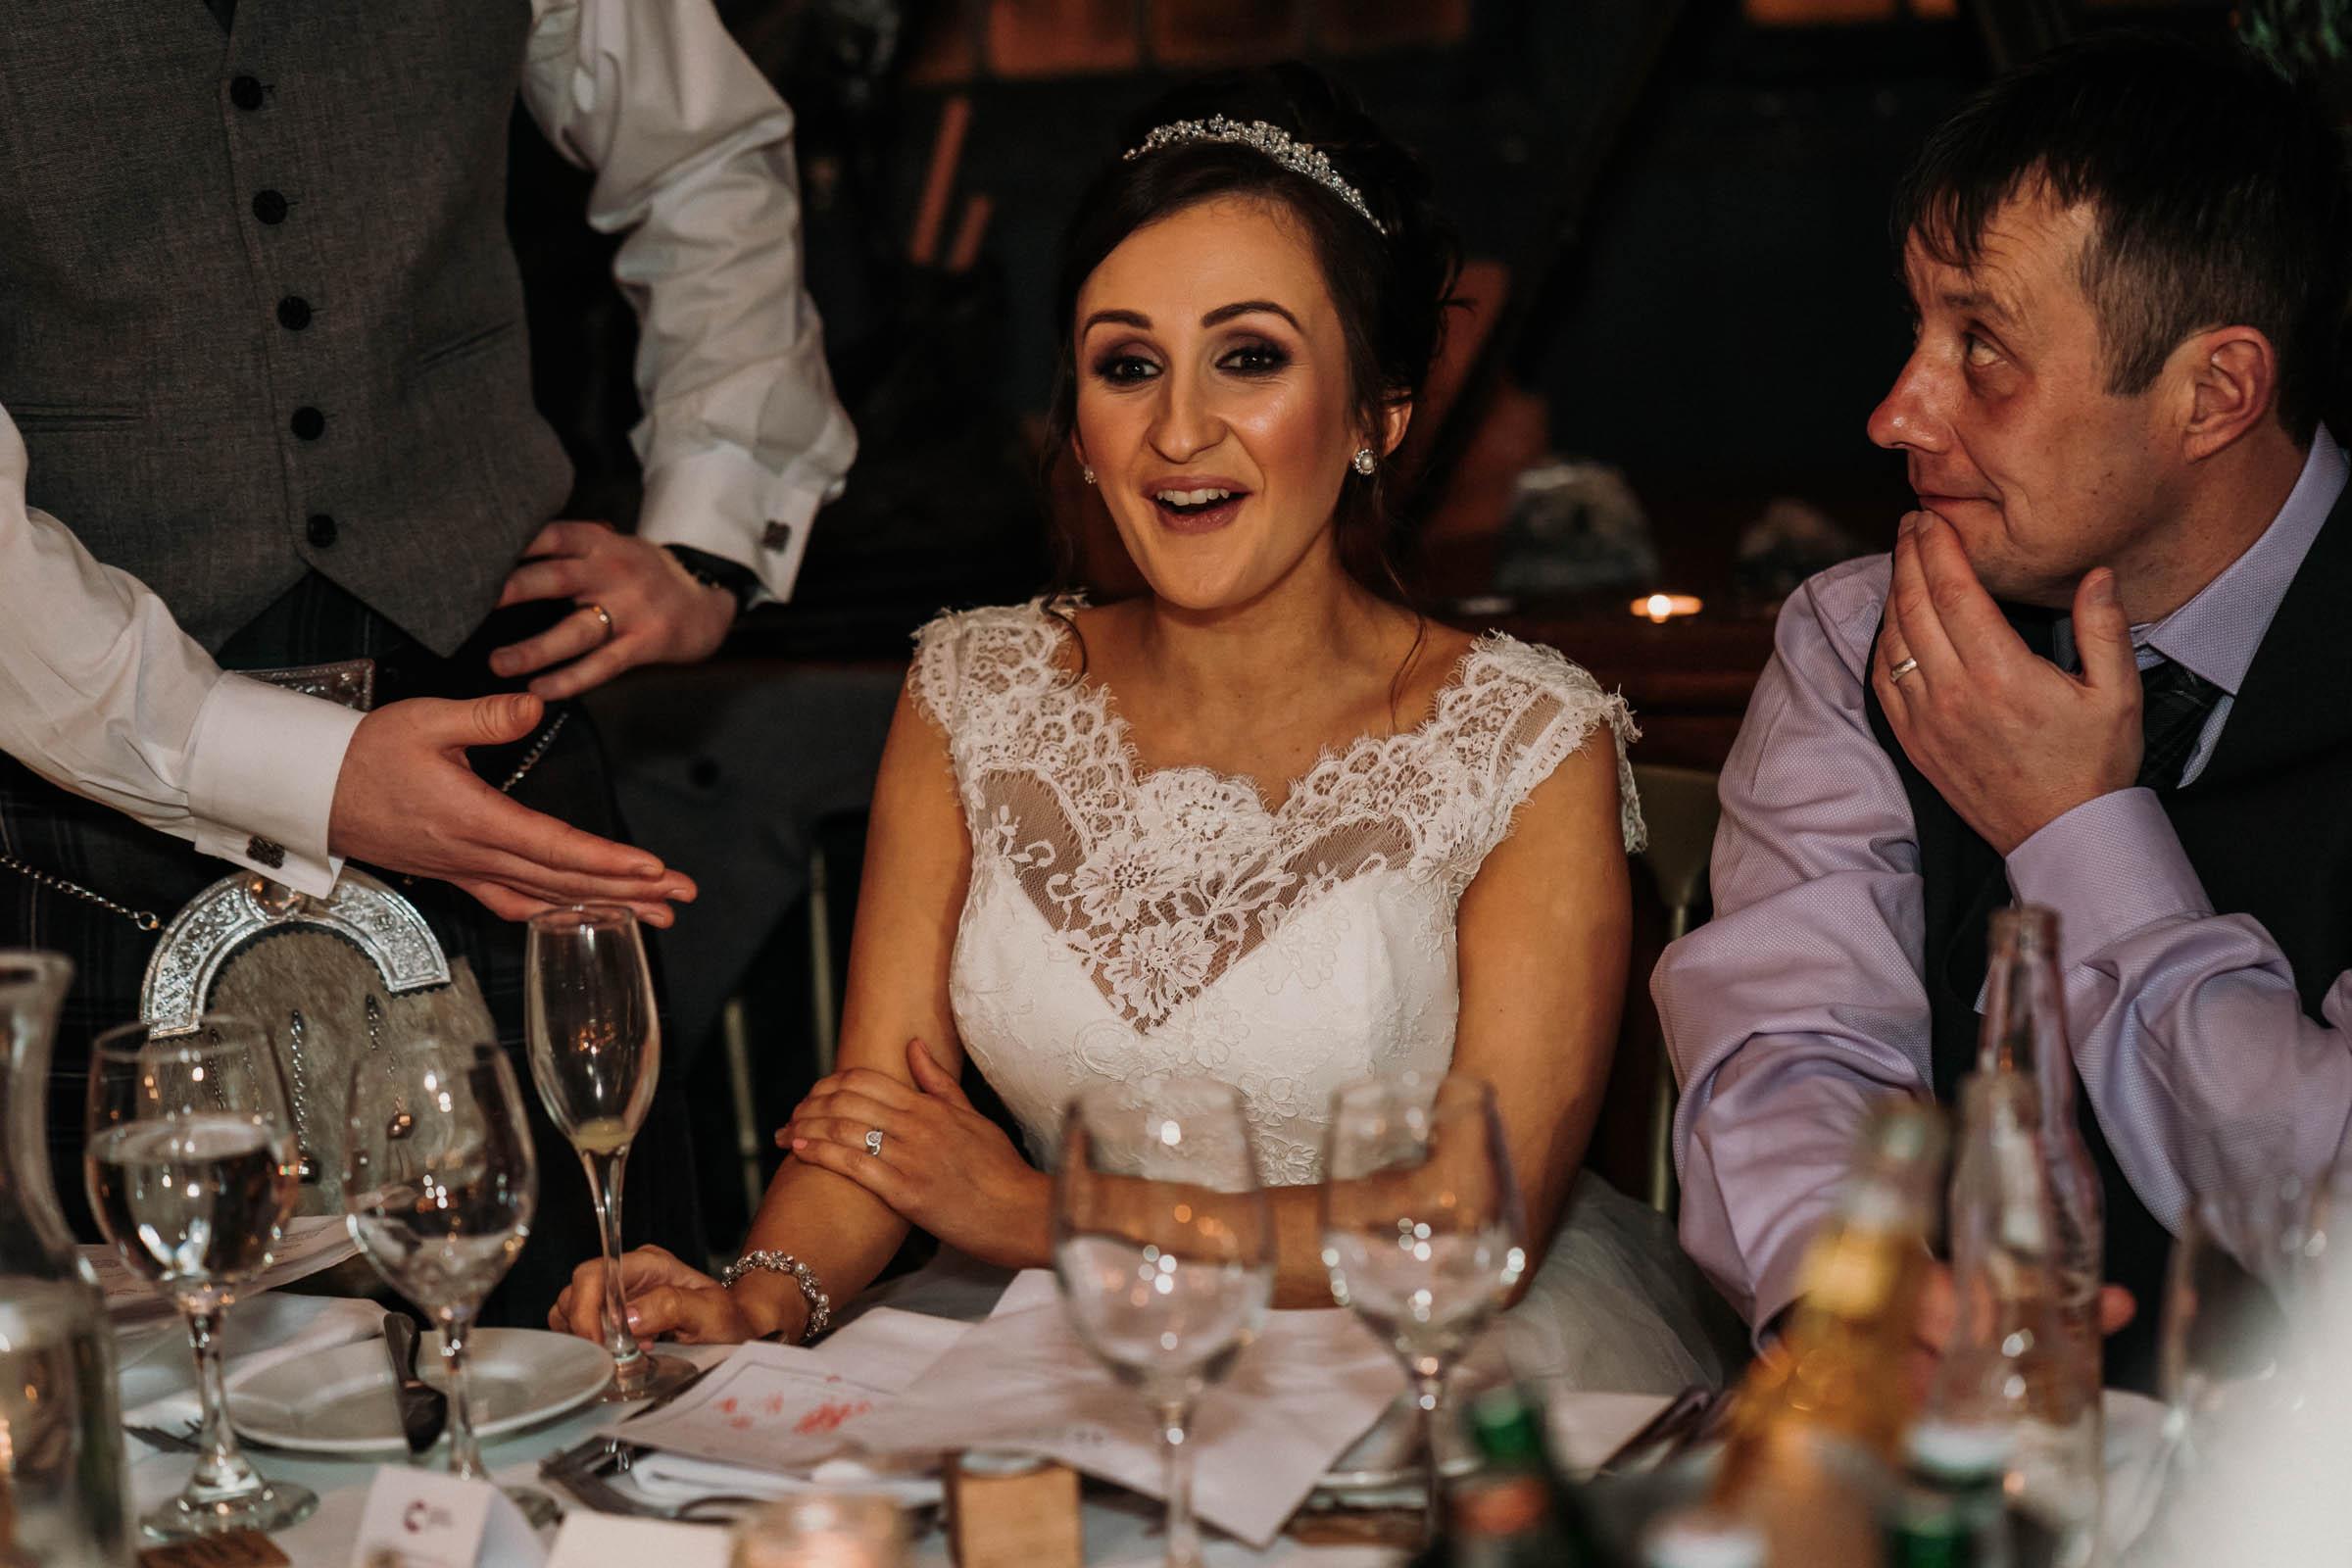 Oran-Mor-Wedding-Photographer-DearlyPhotography (37 of 55).jpg